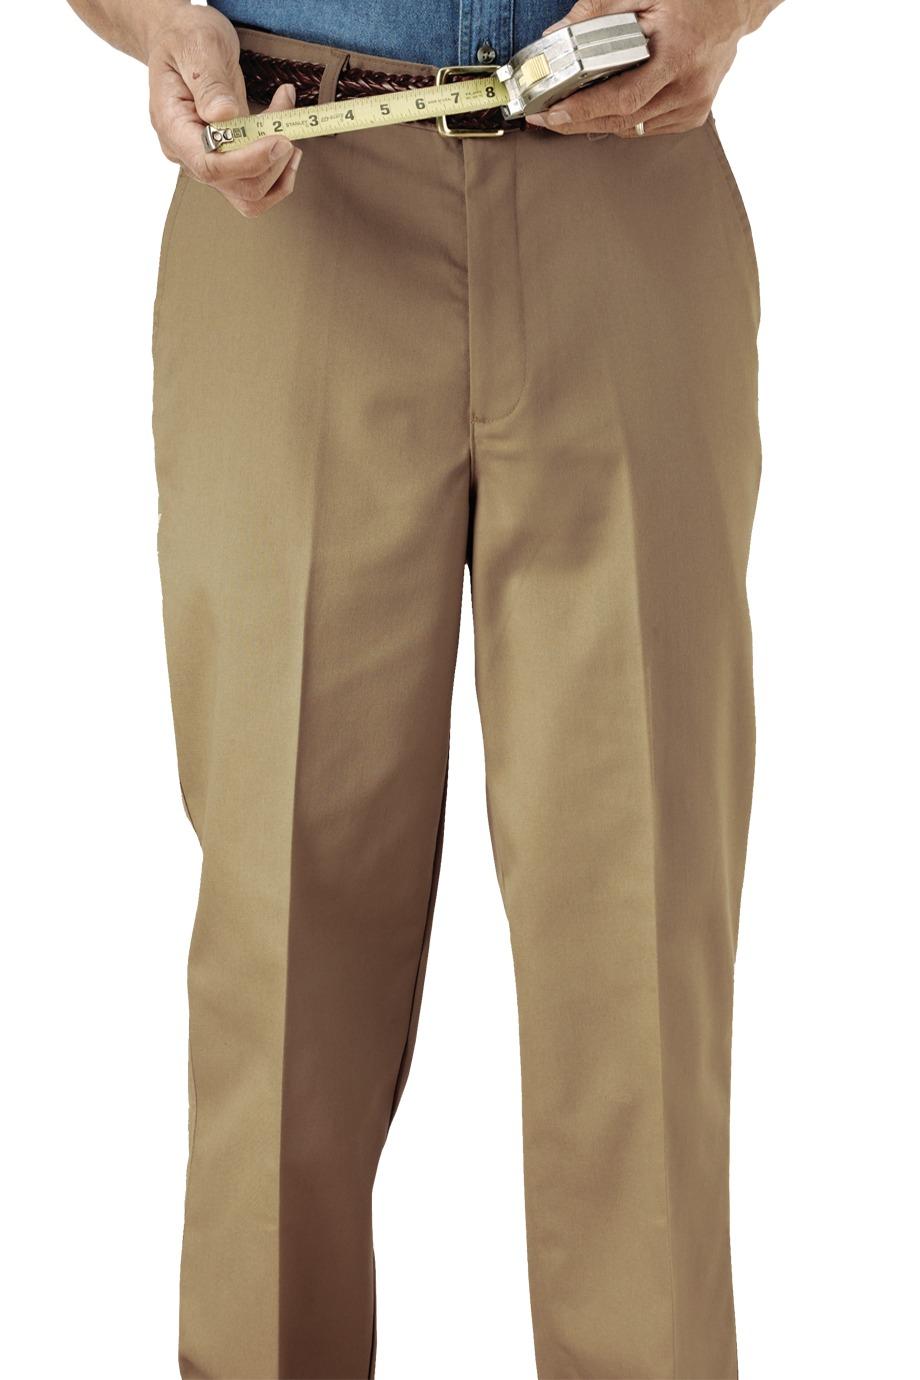 Edwards Garment 2577 - Men's Utility Flat Front Pant